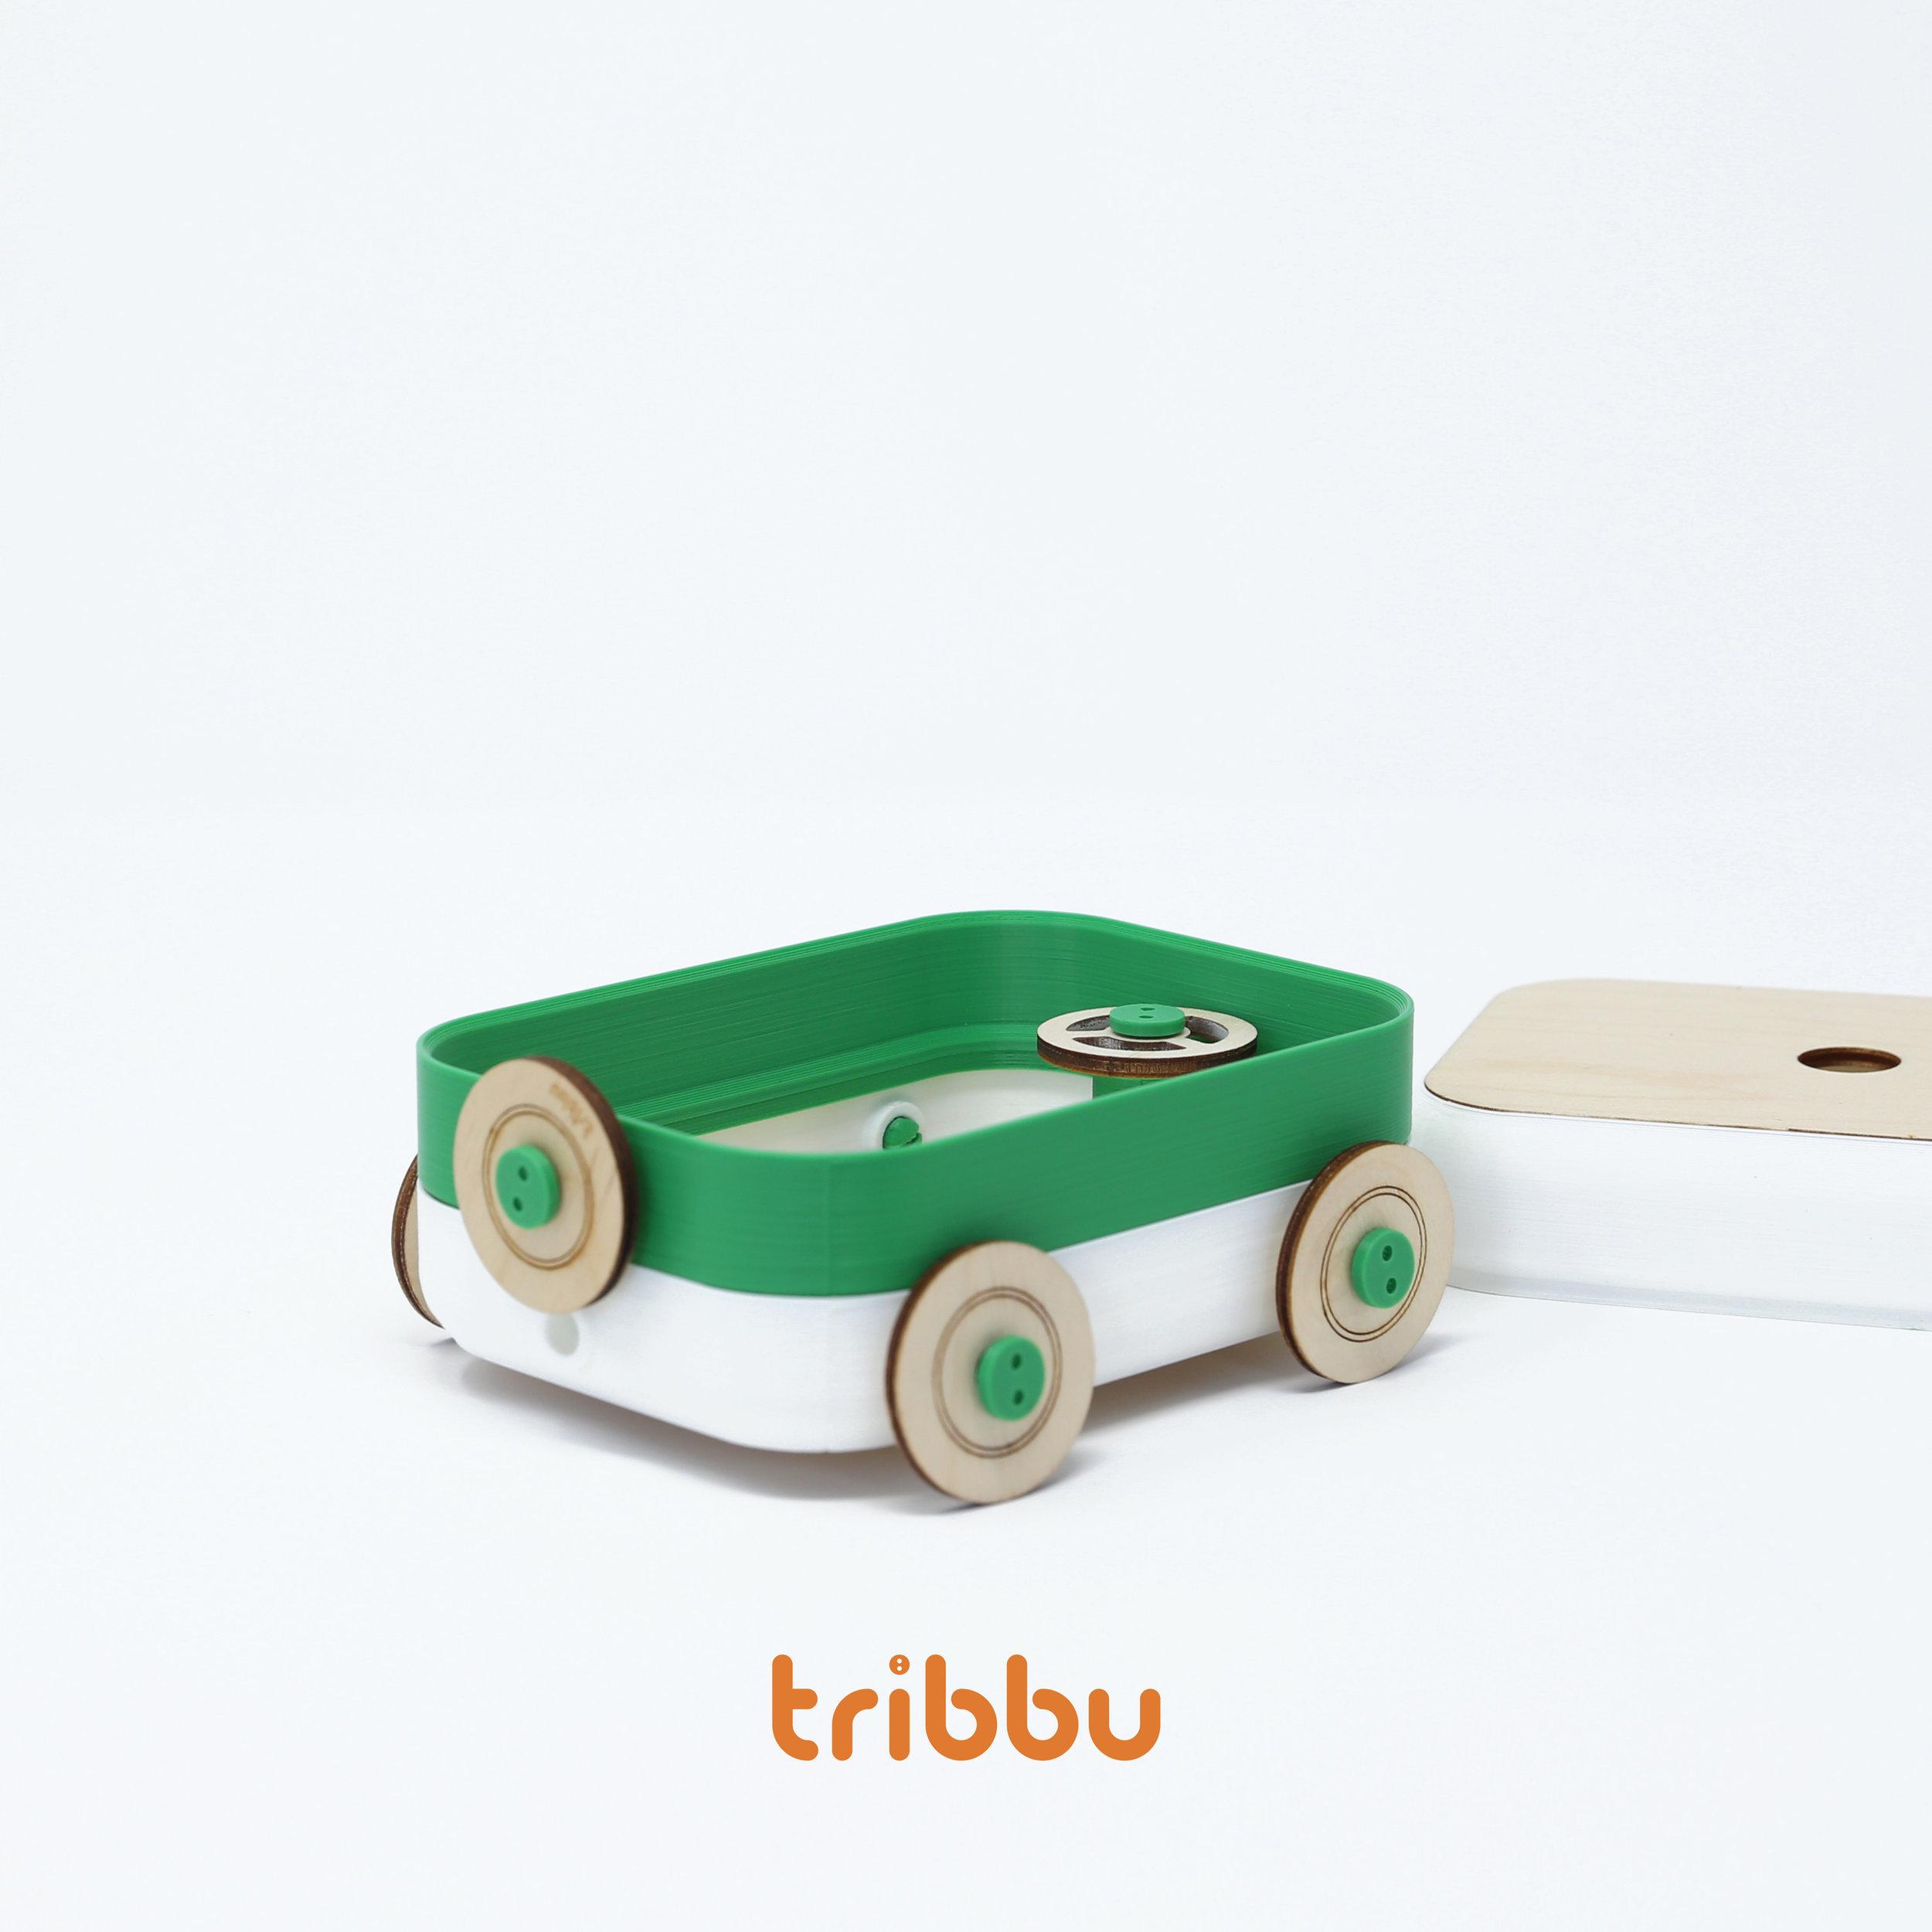 jouets tribbu